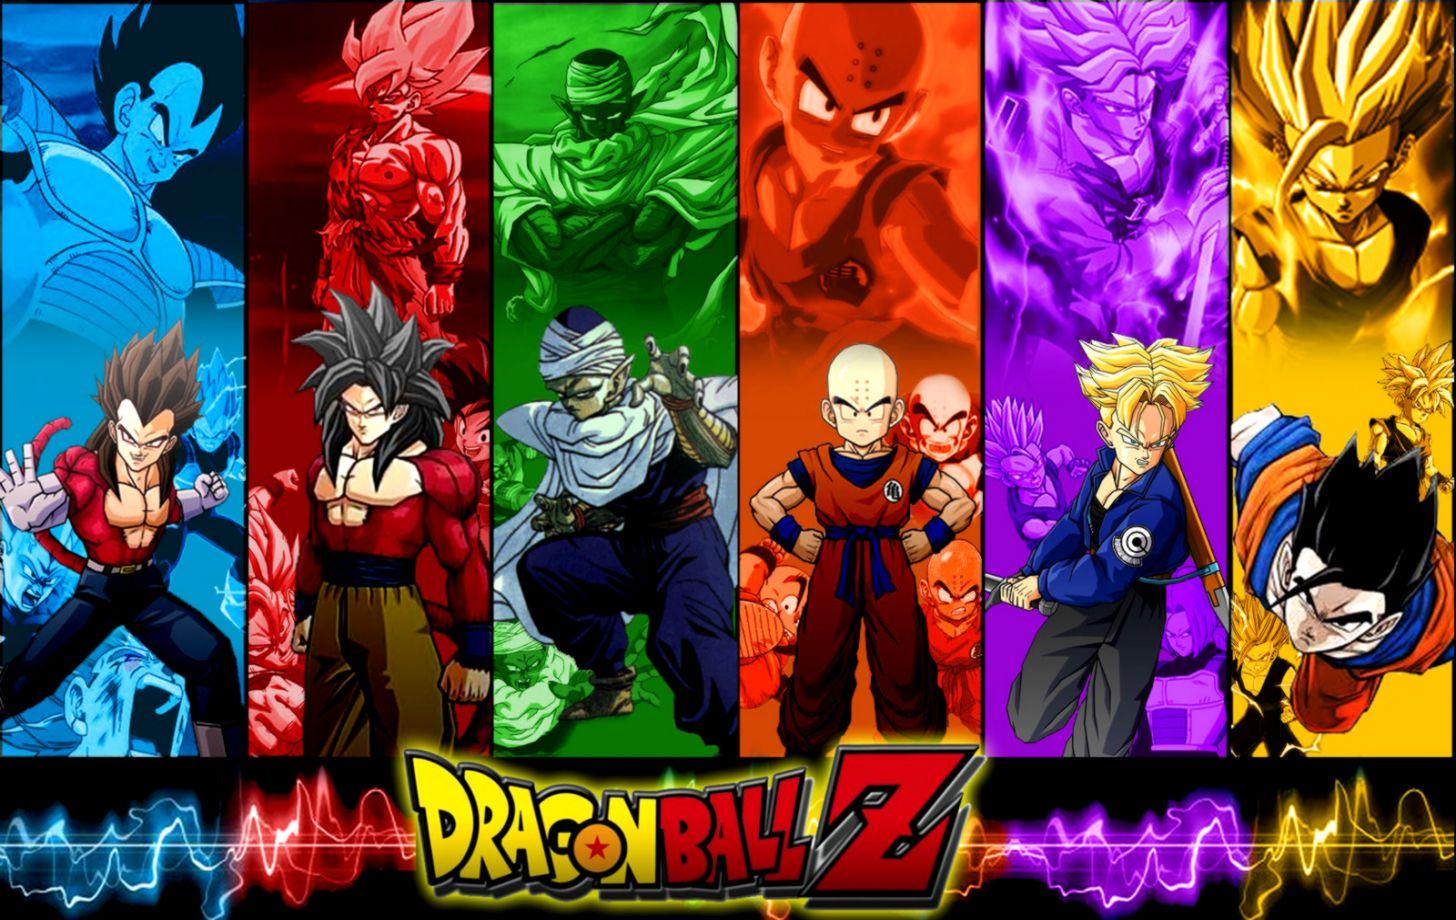 Dragon Ball Z Hd Wallpaper Wallpapers Master